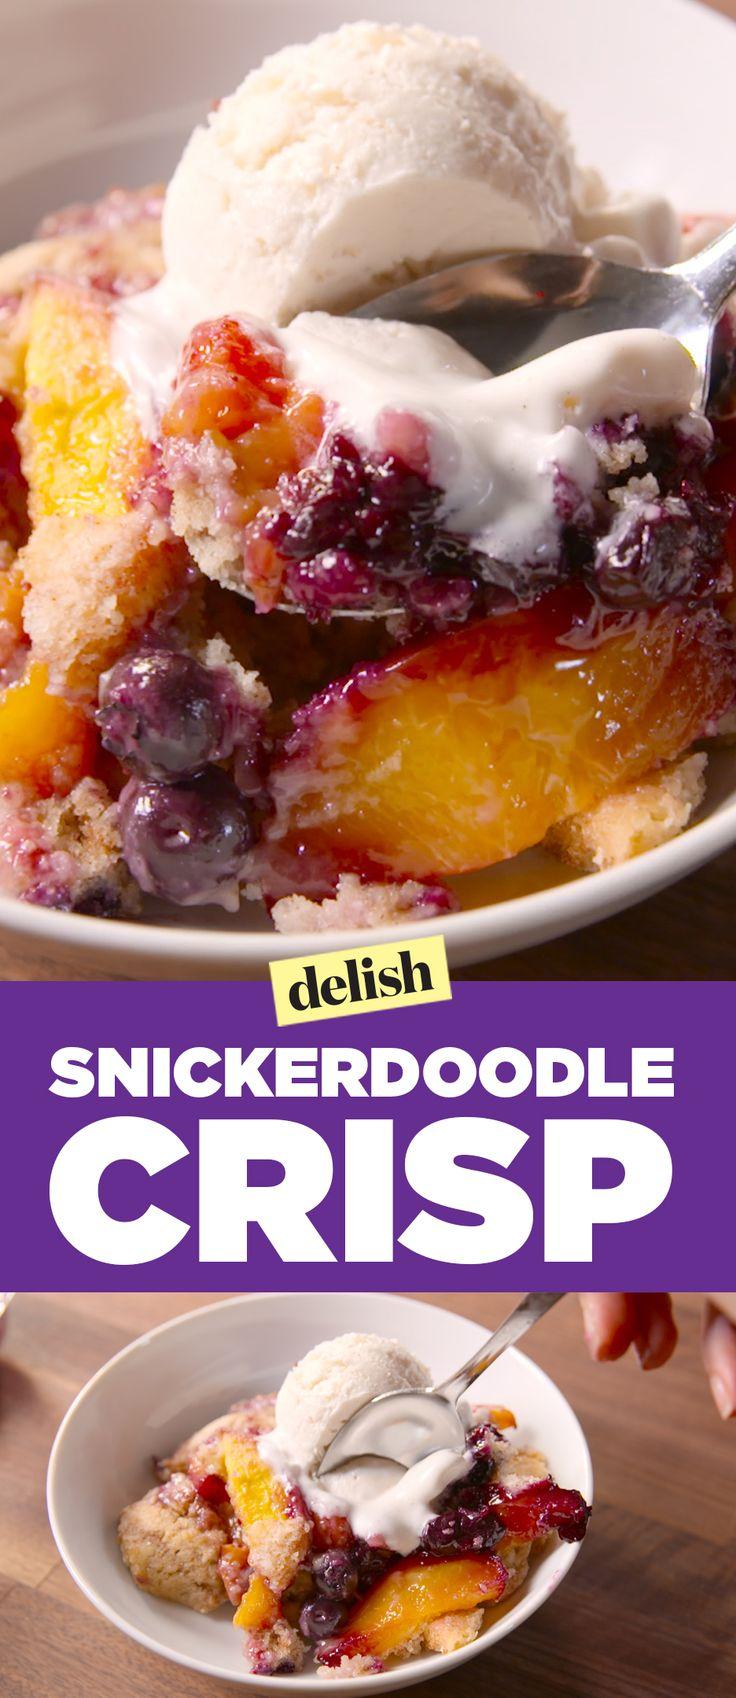 Snickerdoodle Crisp